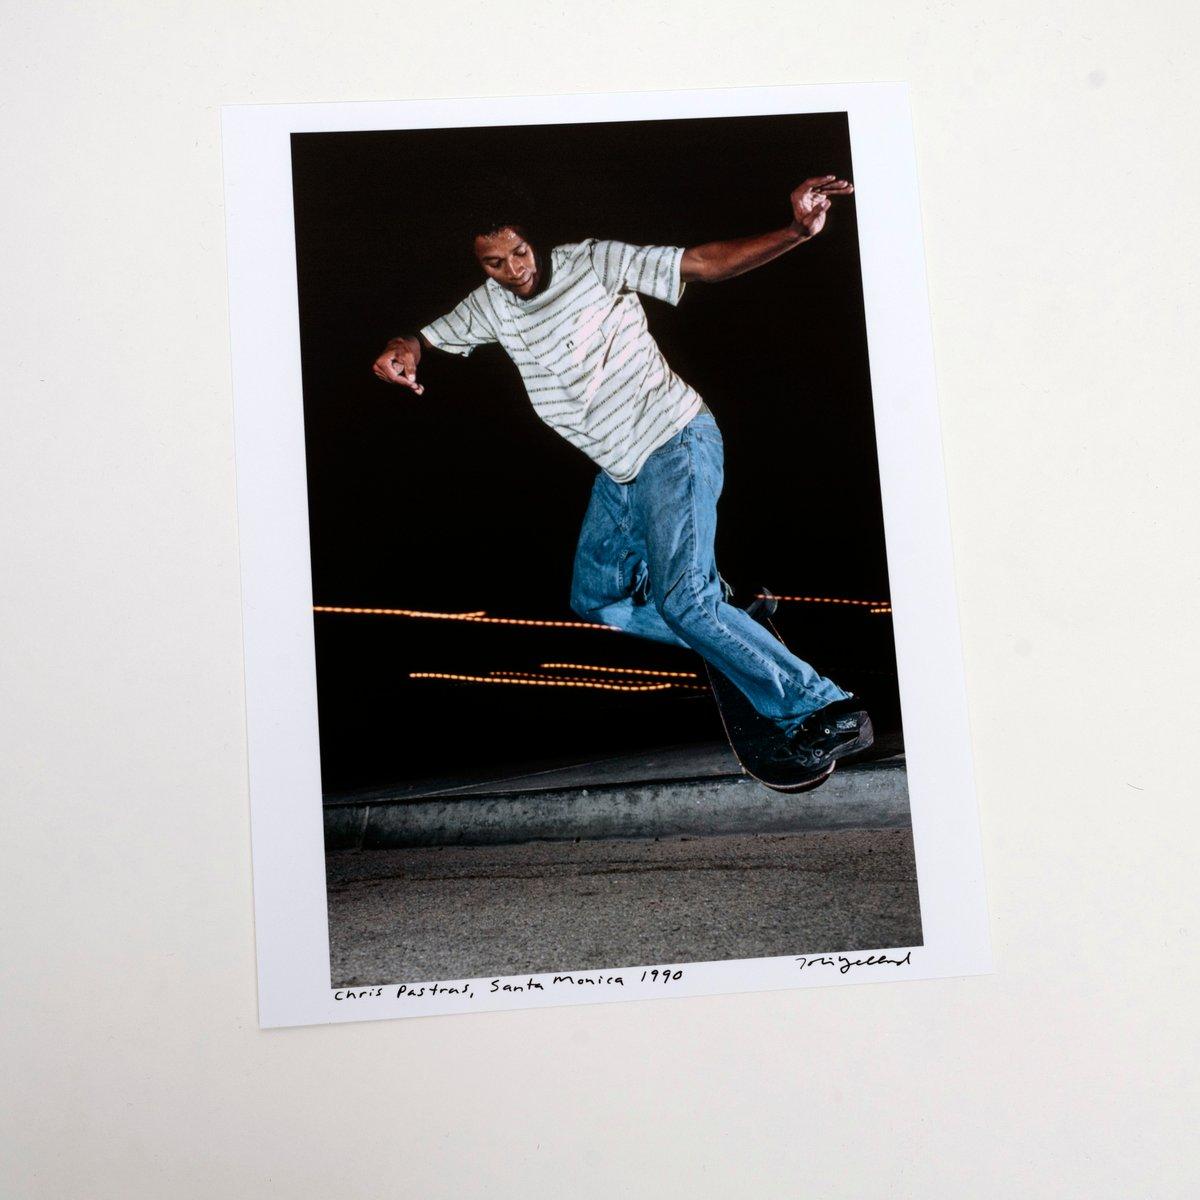 Image of Chris Pastras, Santa Monica 1991